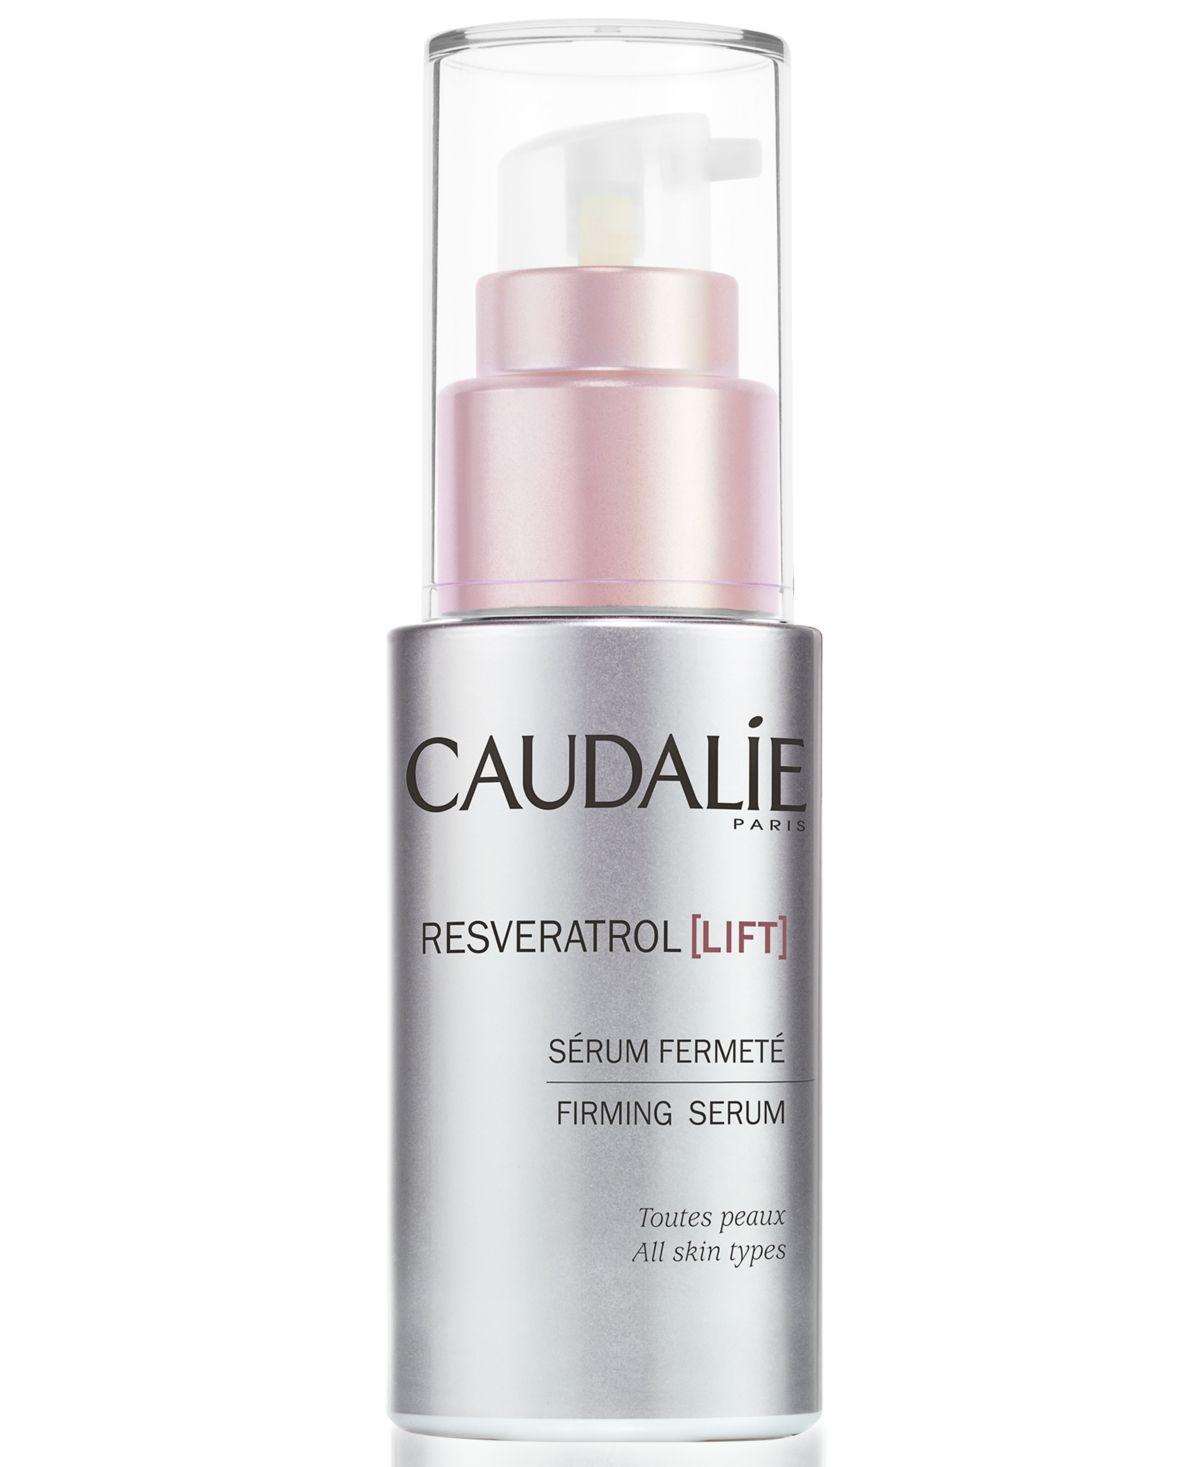 Caudalie Resveratrol Lift Firming Serum 1oz Serum Skin Care